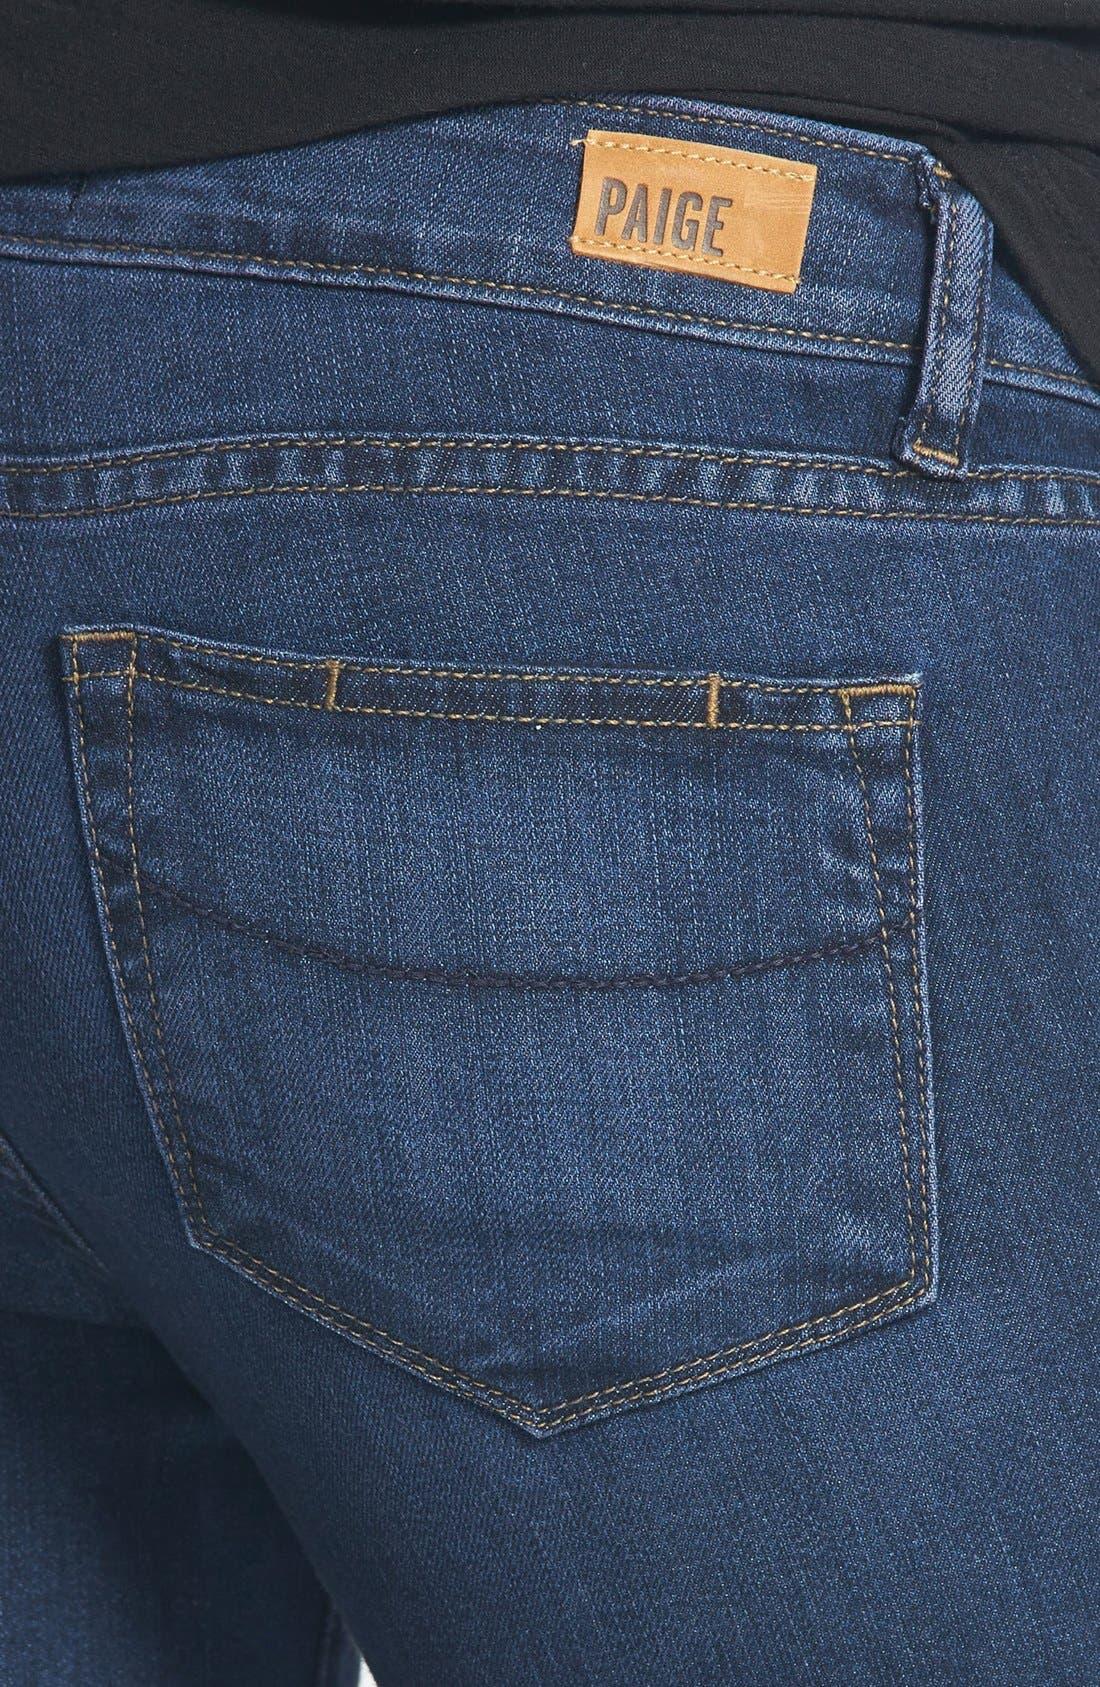 Alternate Image 3  - Paige Denim 'Kylie' Crop Skinny Jeans (Claire)